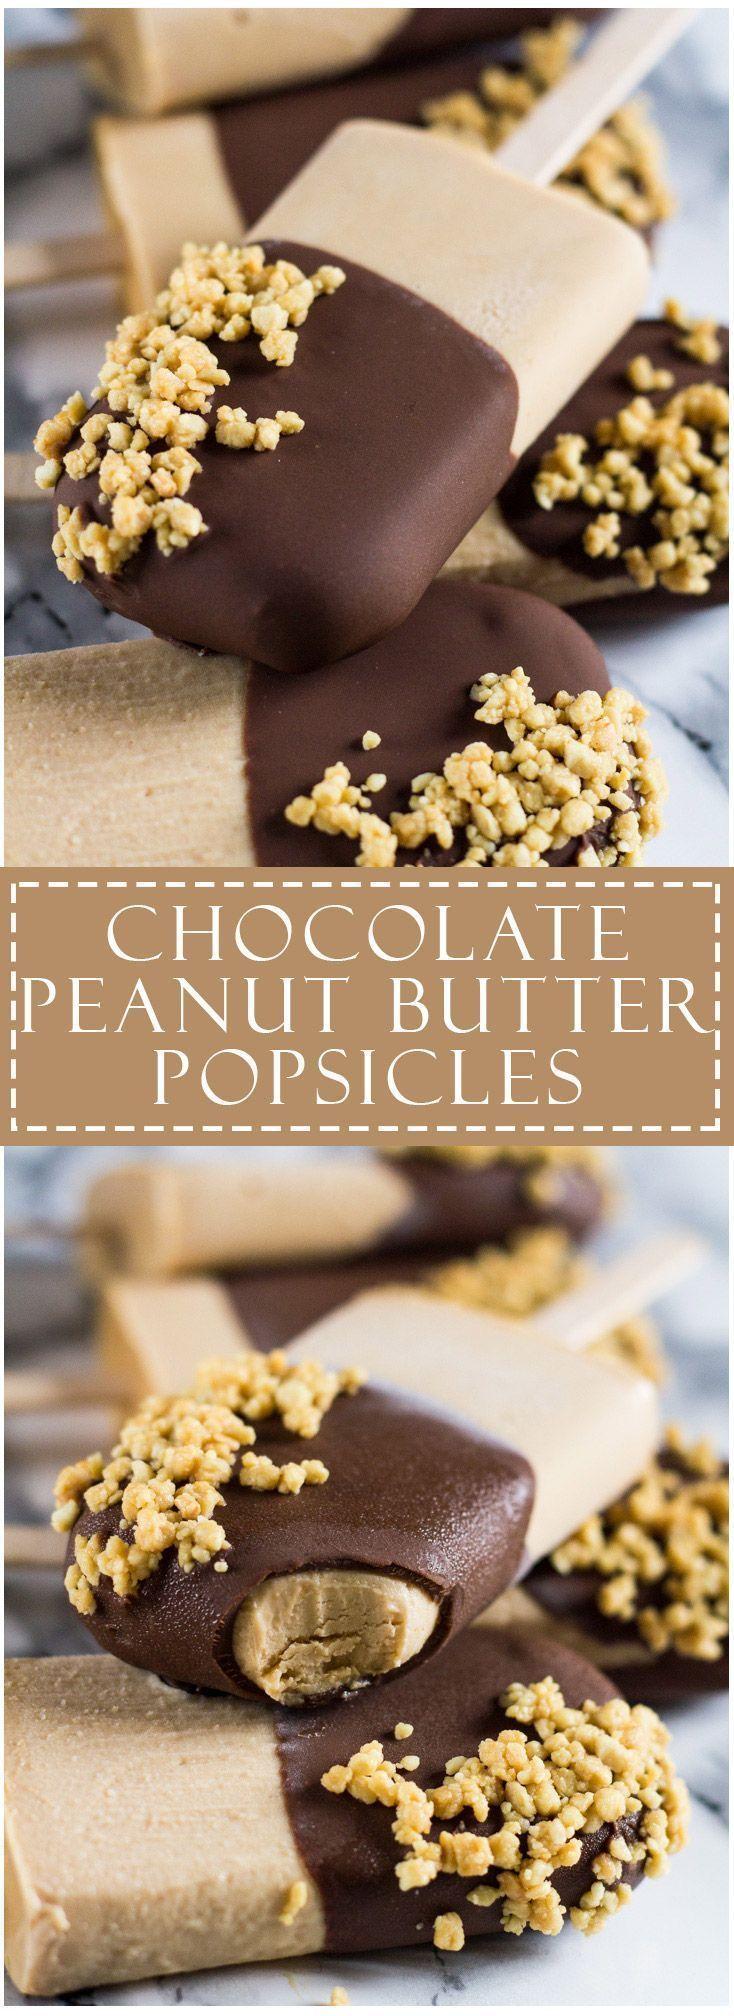 Chocolate Peanut Butter Yoghurt Popsicles | marshasbakingaddiction.com…